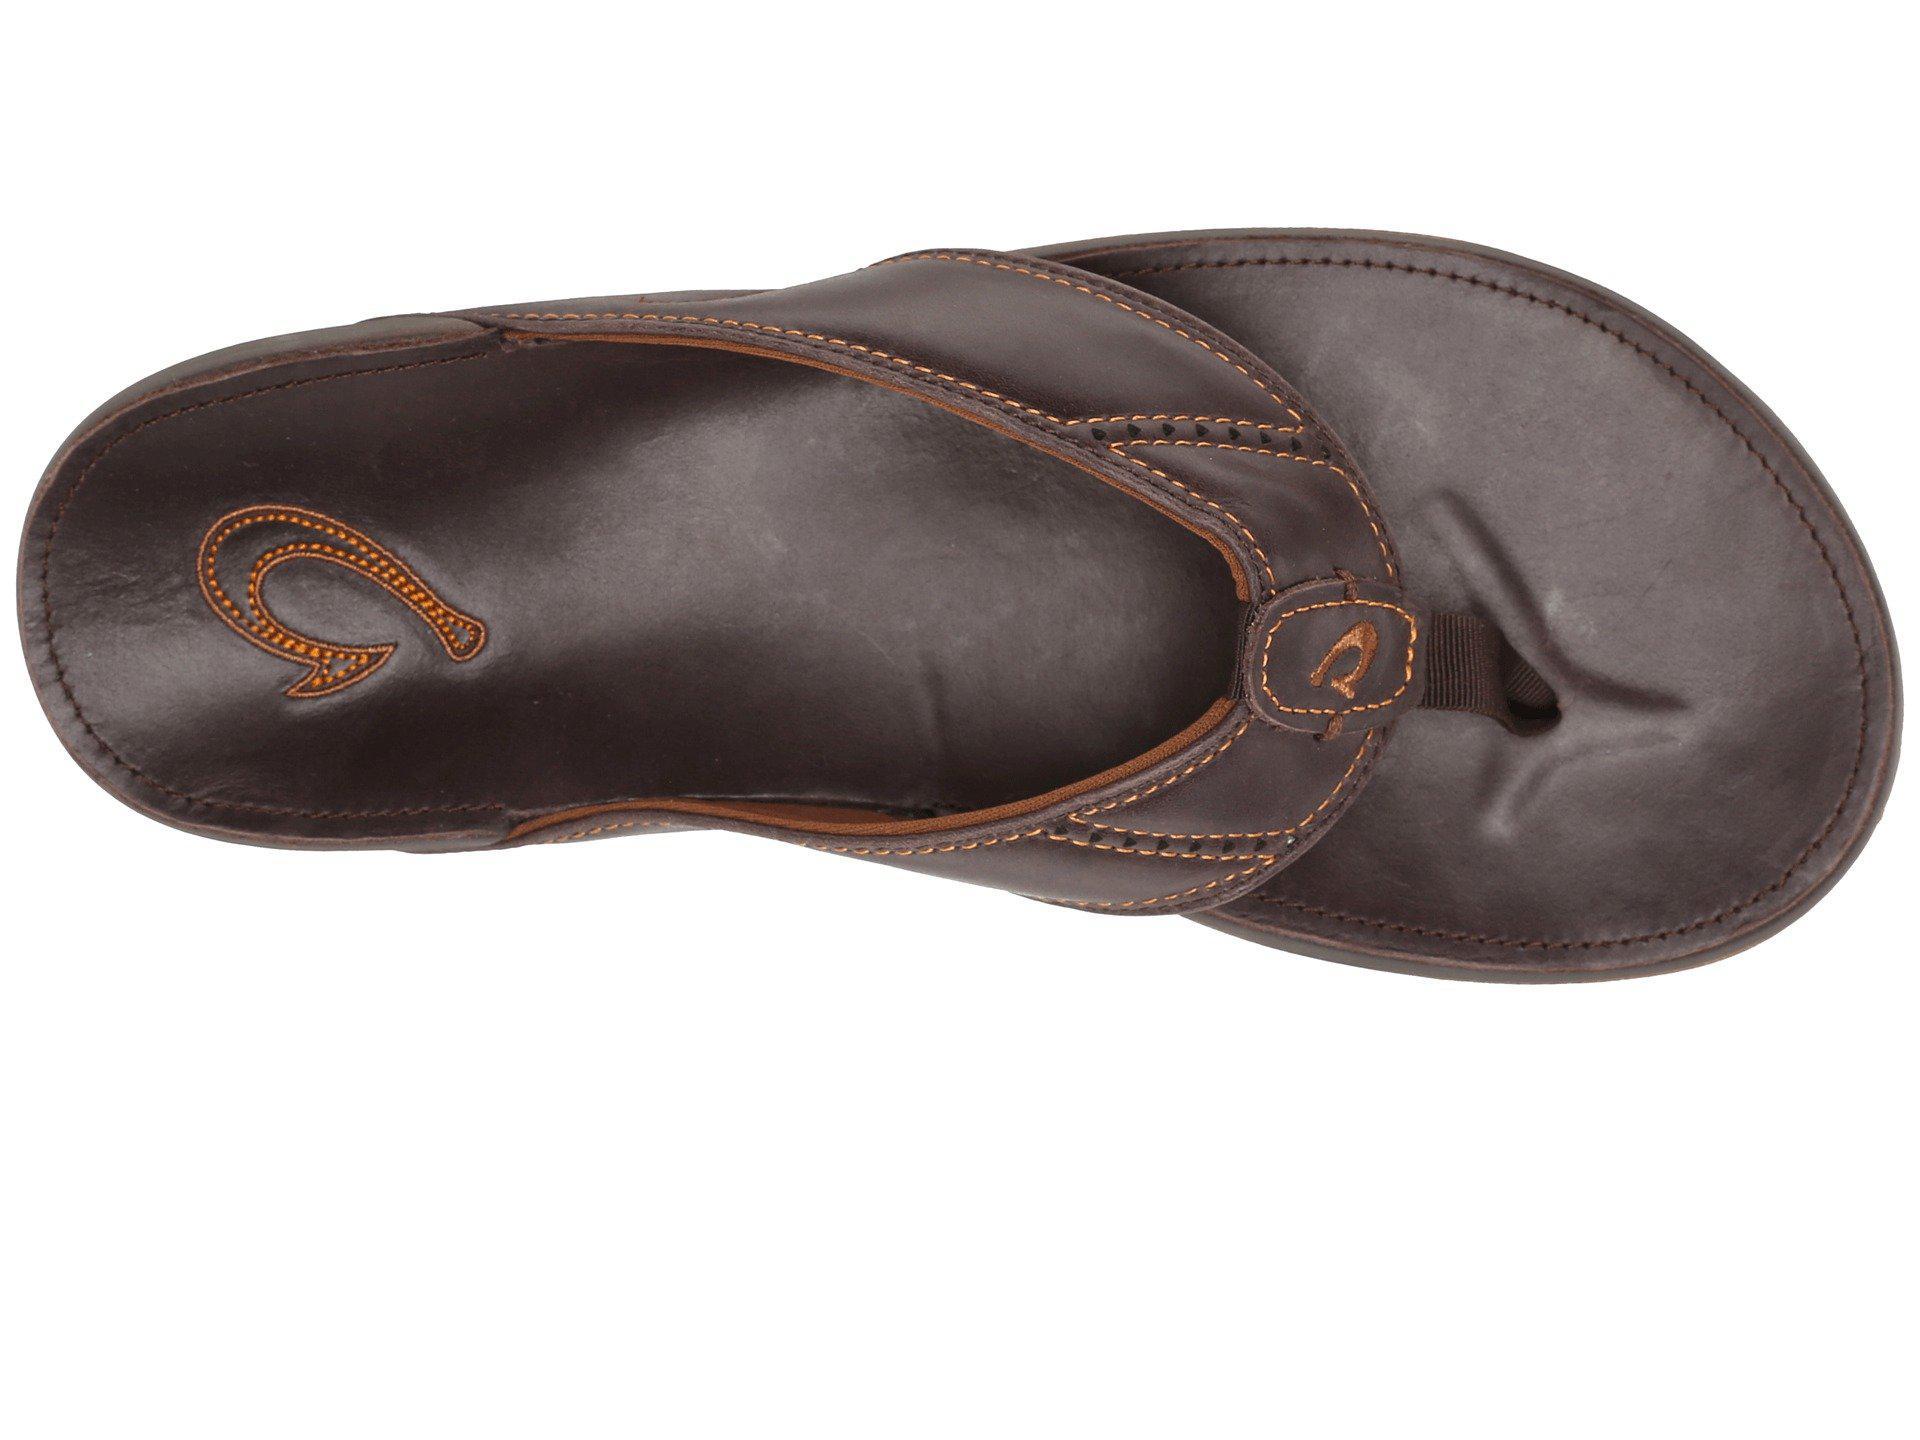 ce7a771d90a1 Olukai - Brown Nui (onyx onyx) Men s Sandals for Men - Lyst. View fullscreen